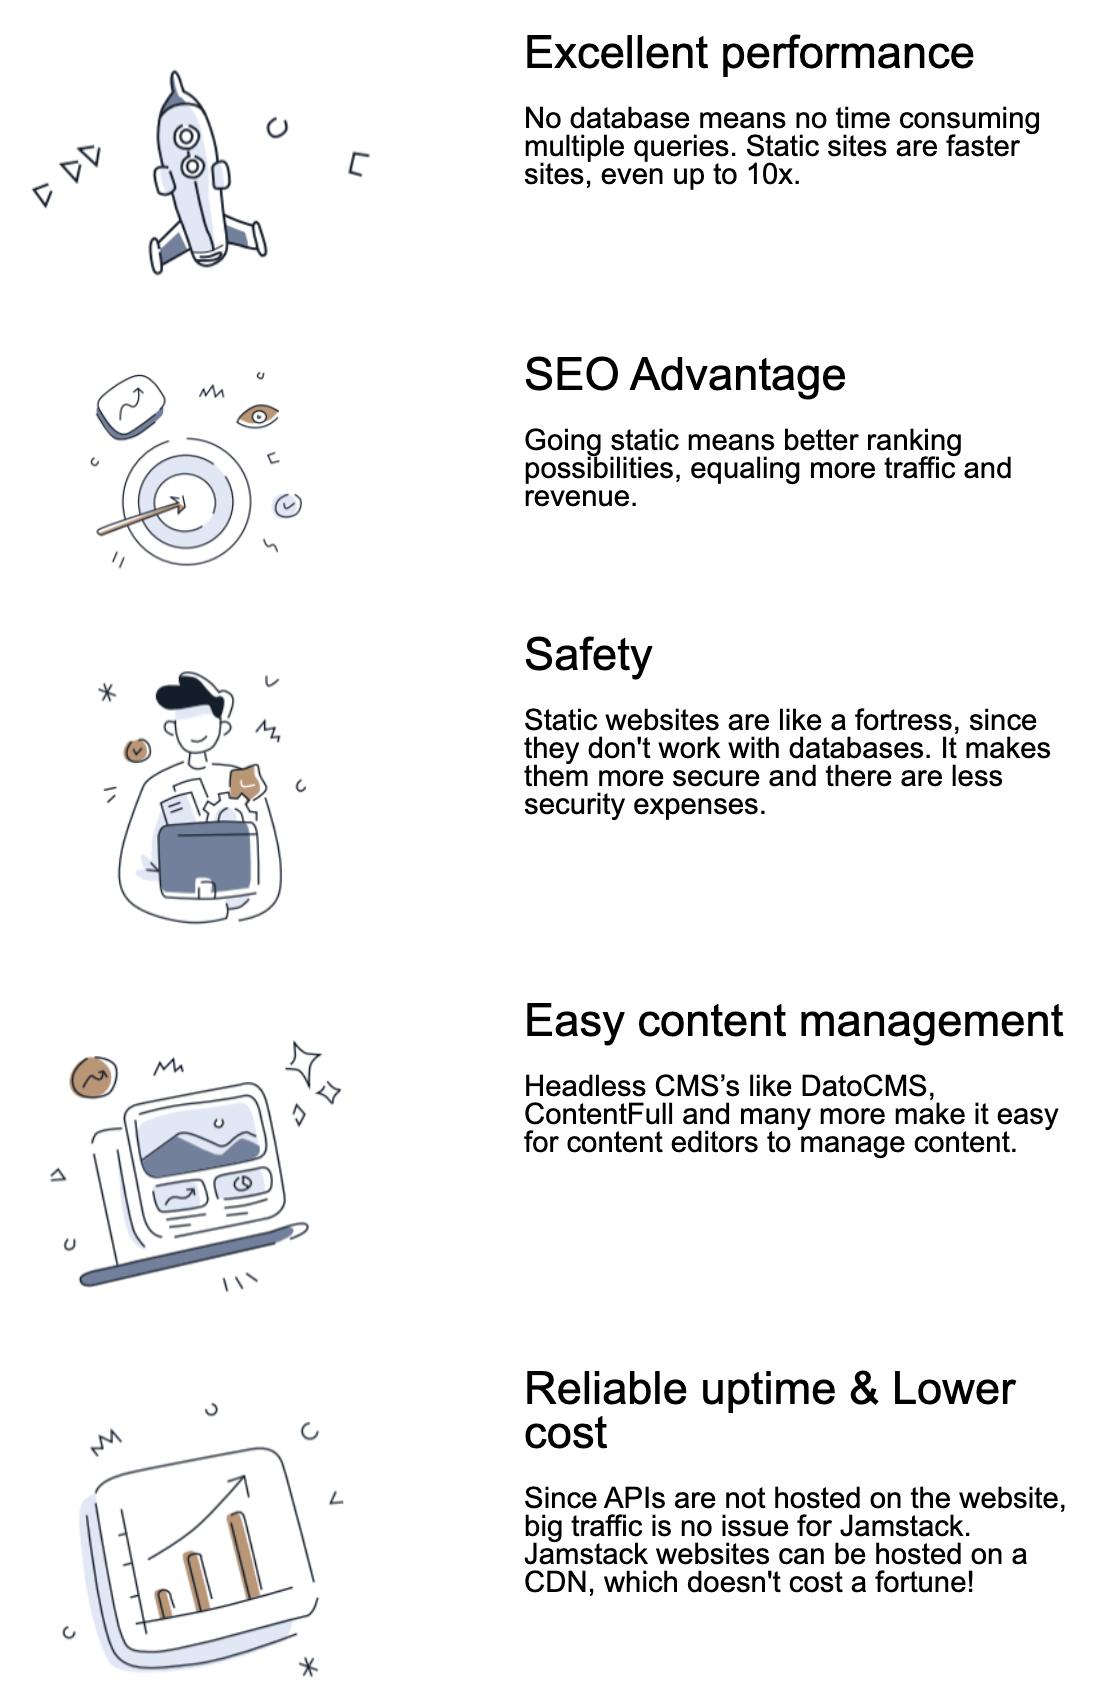 Major advantages JAMstack